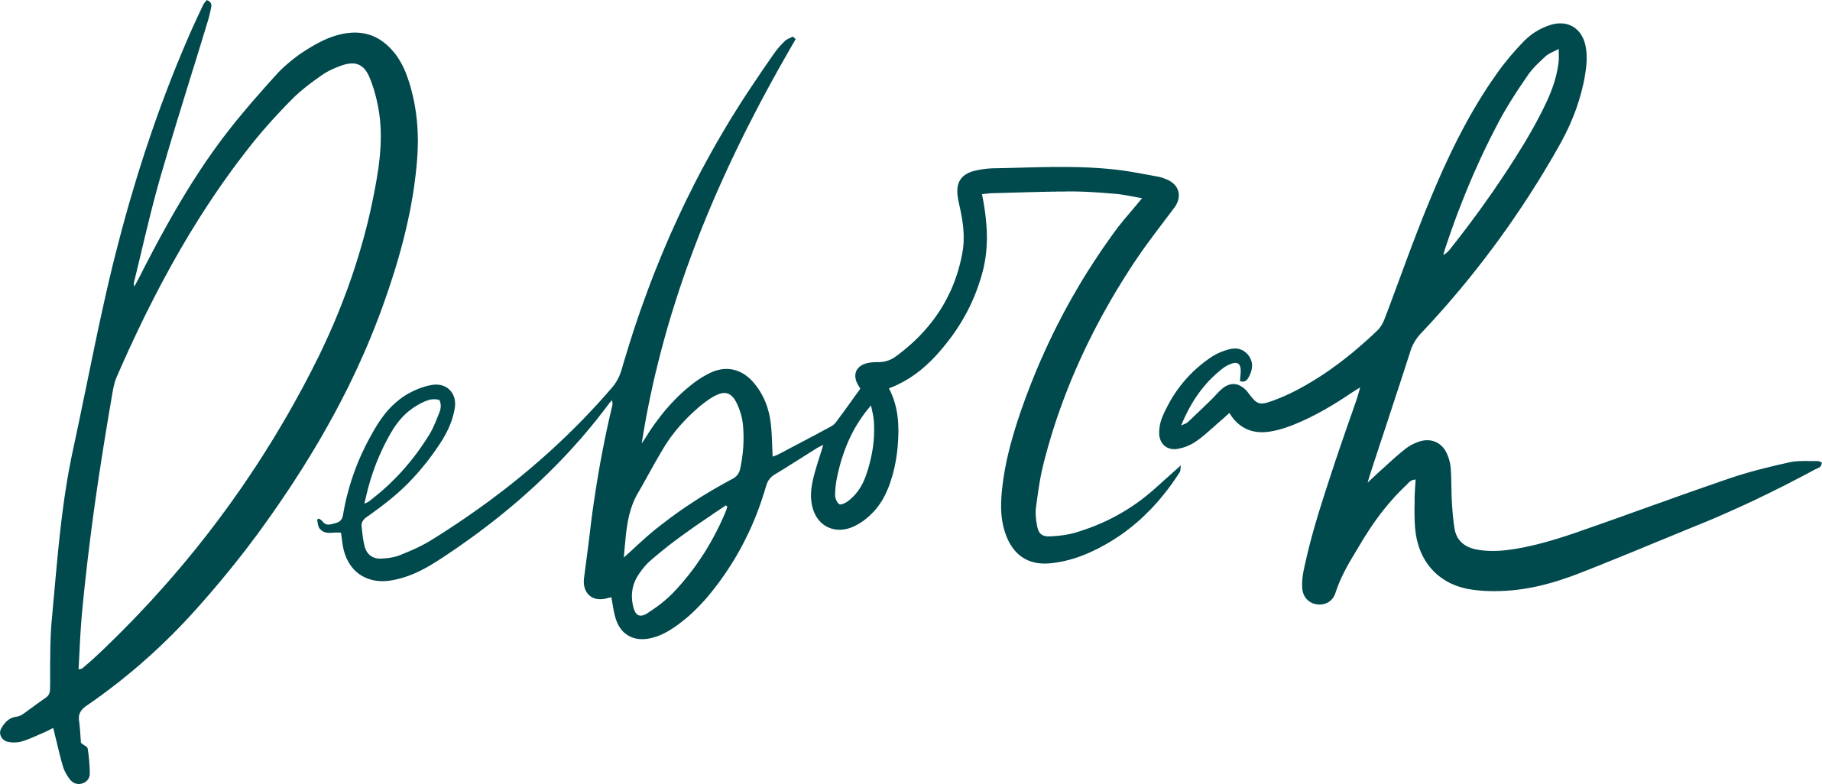 deborah-logo-green.png